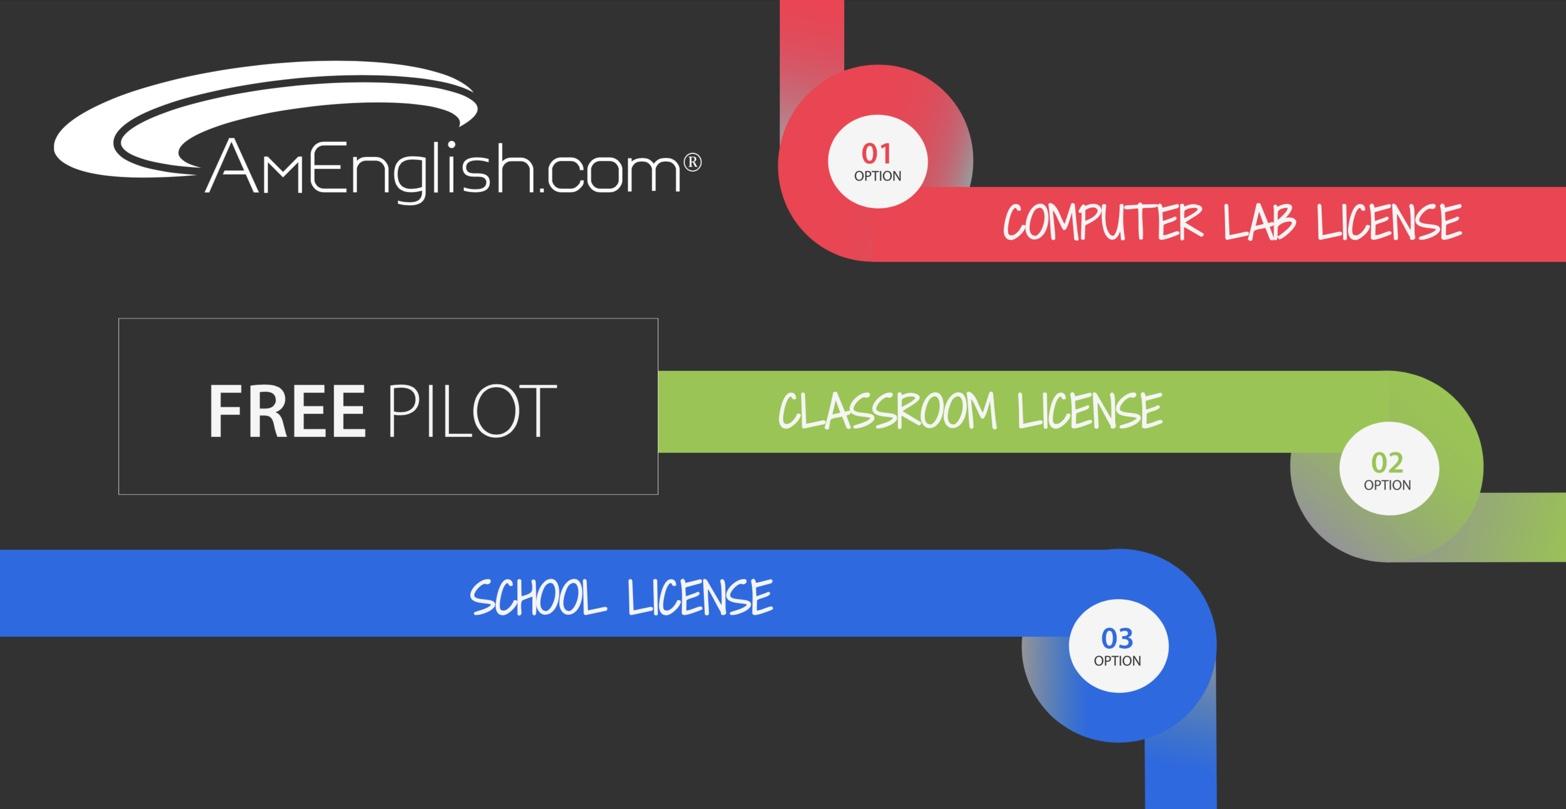 Licenses from AmEnglish.com